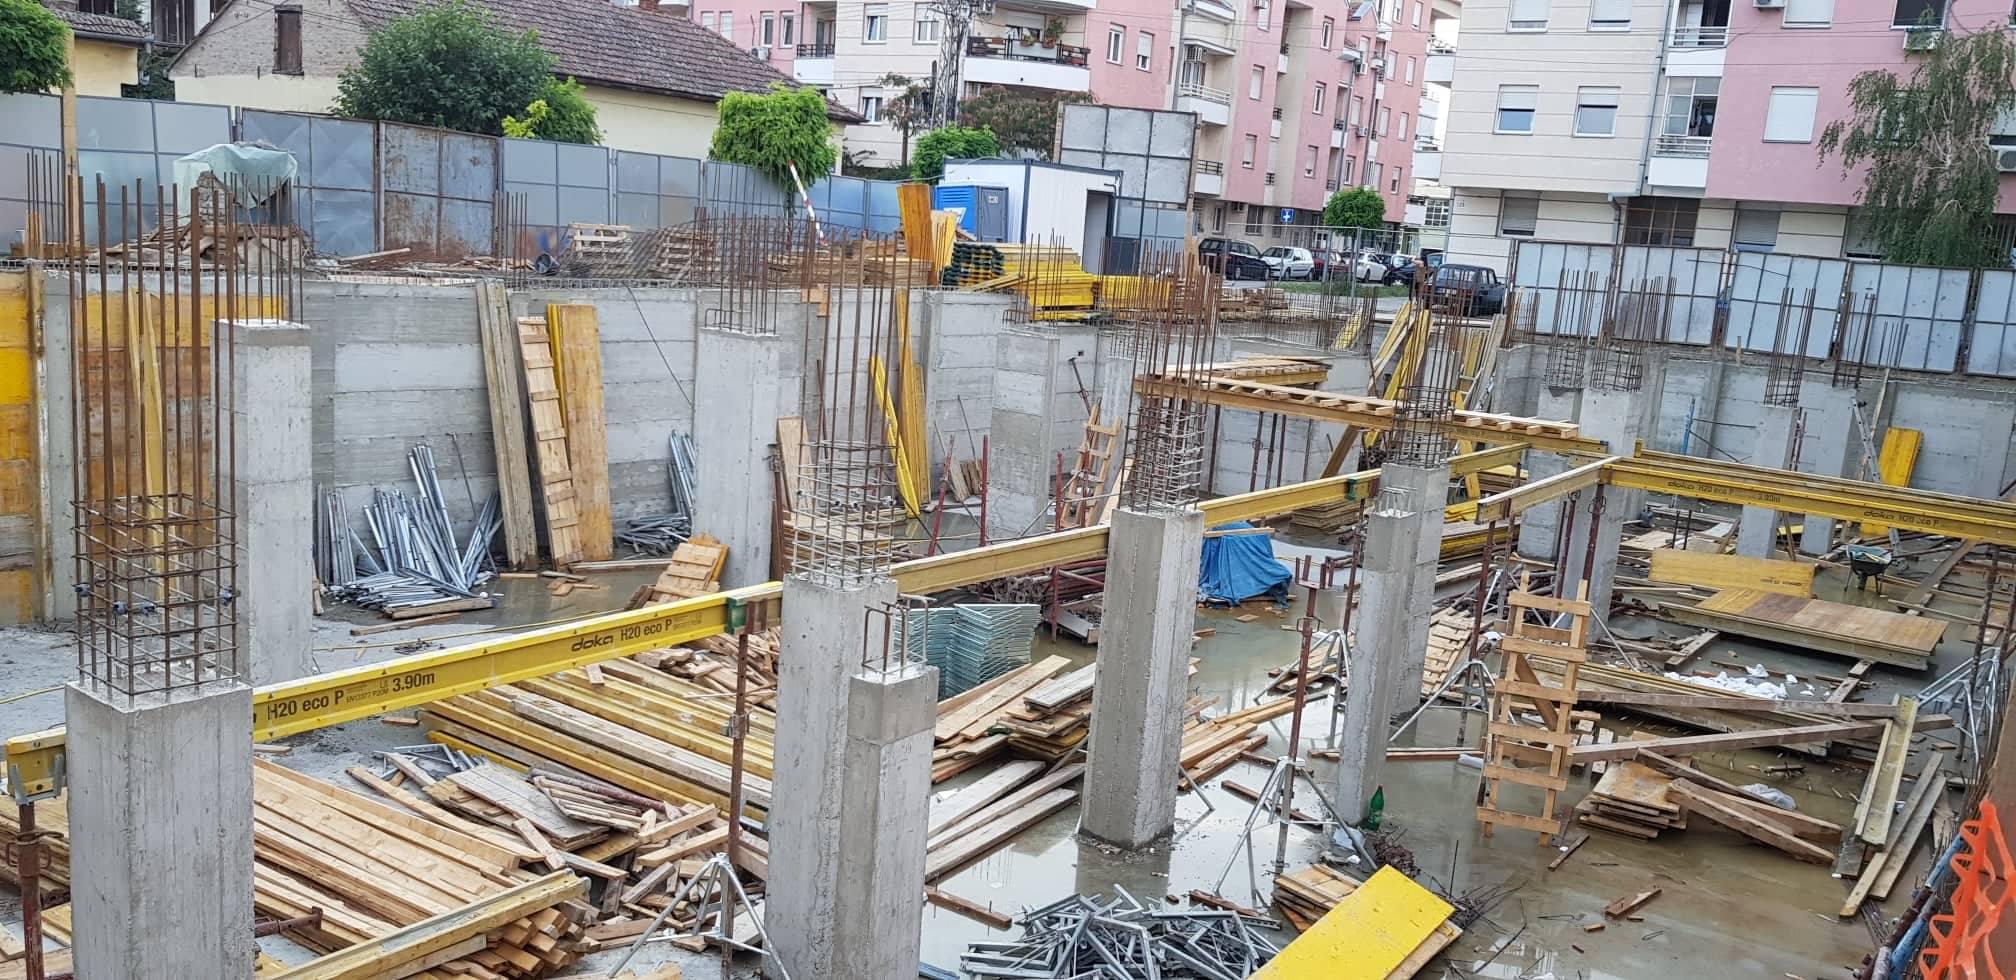 gradilište, Foto: redakcija časopisa Podovi